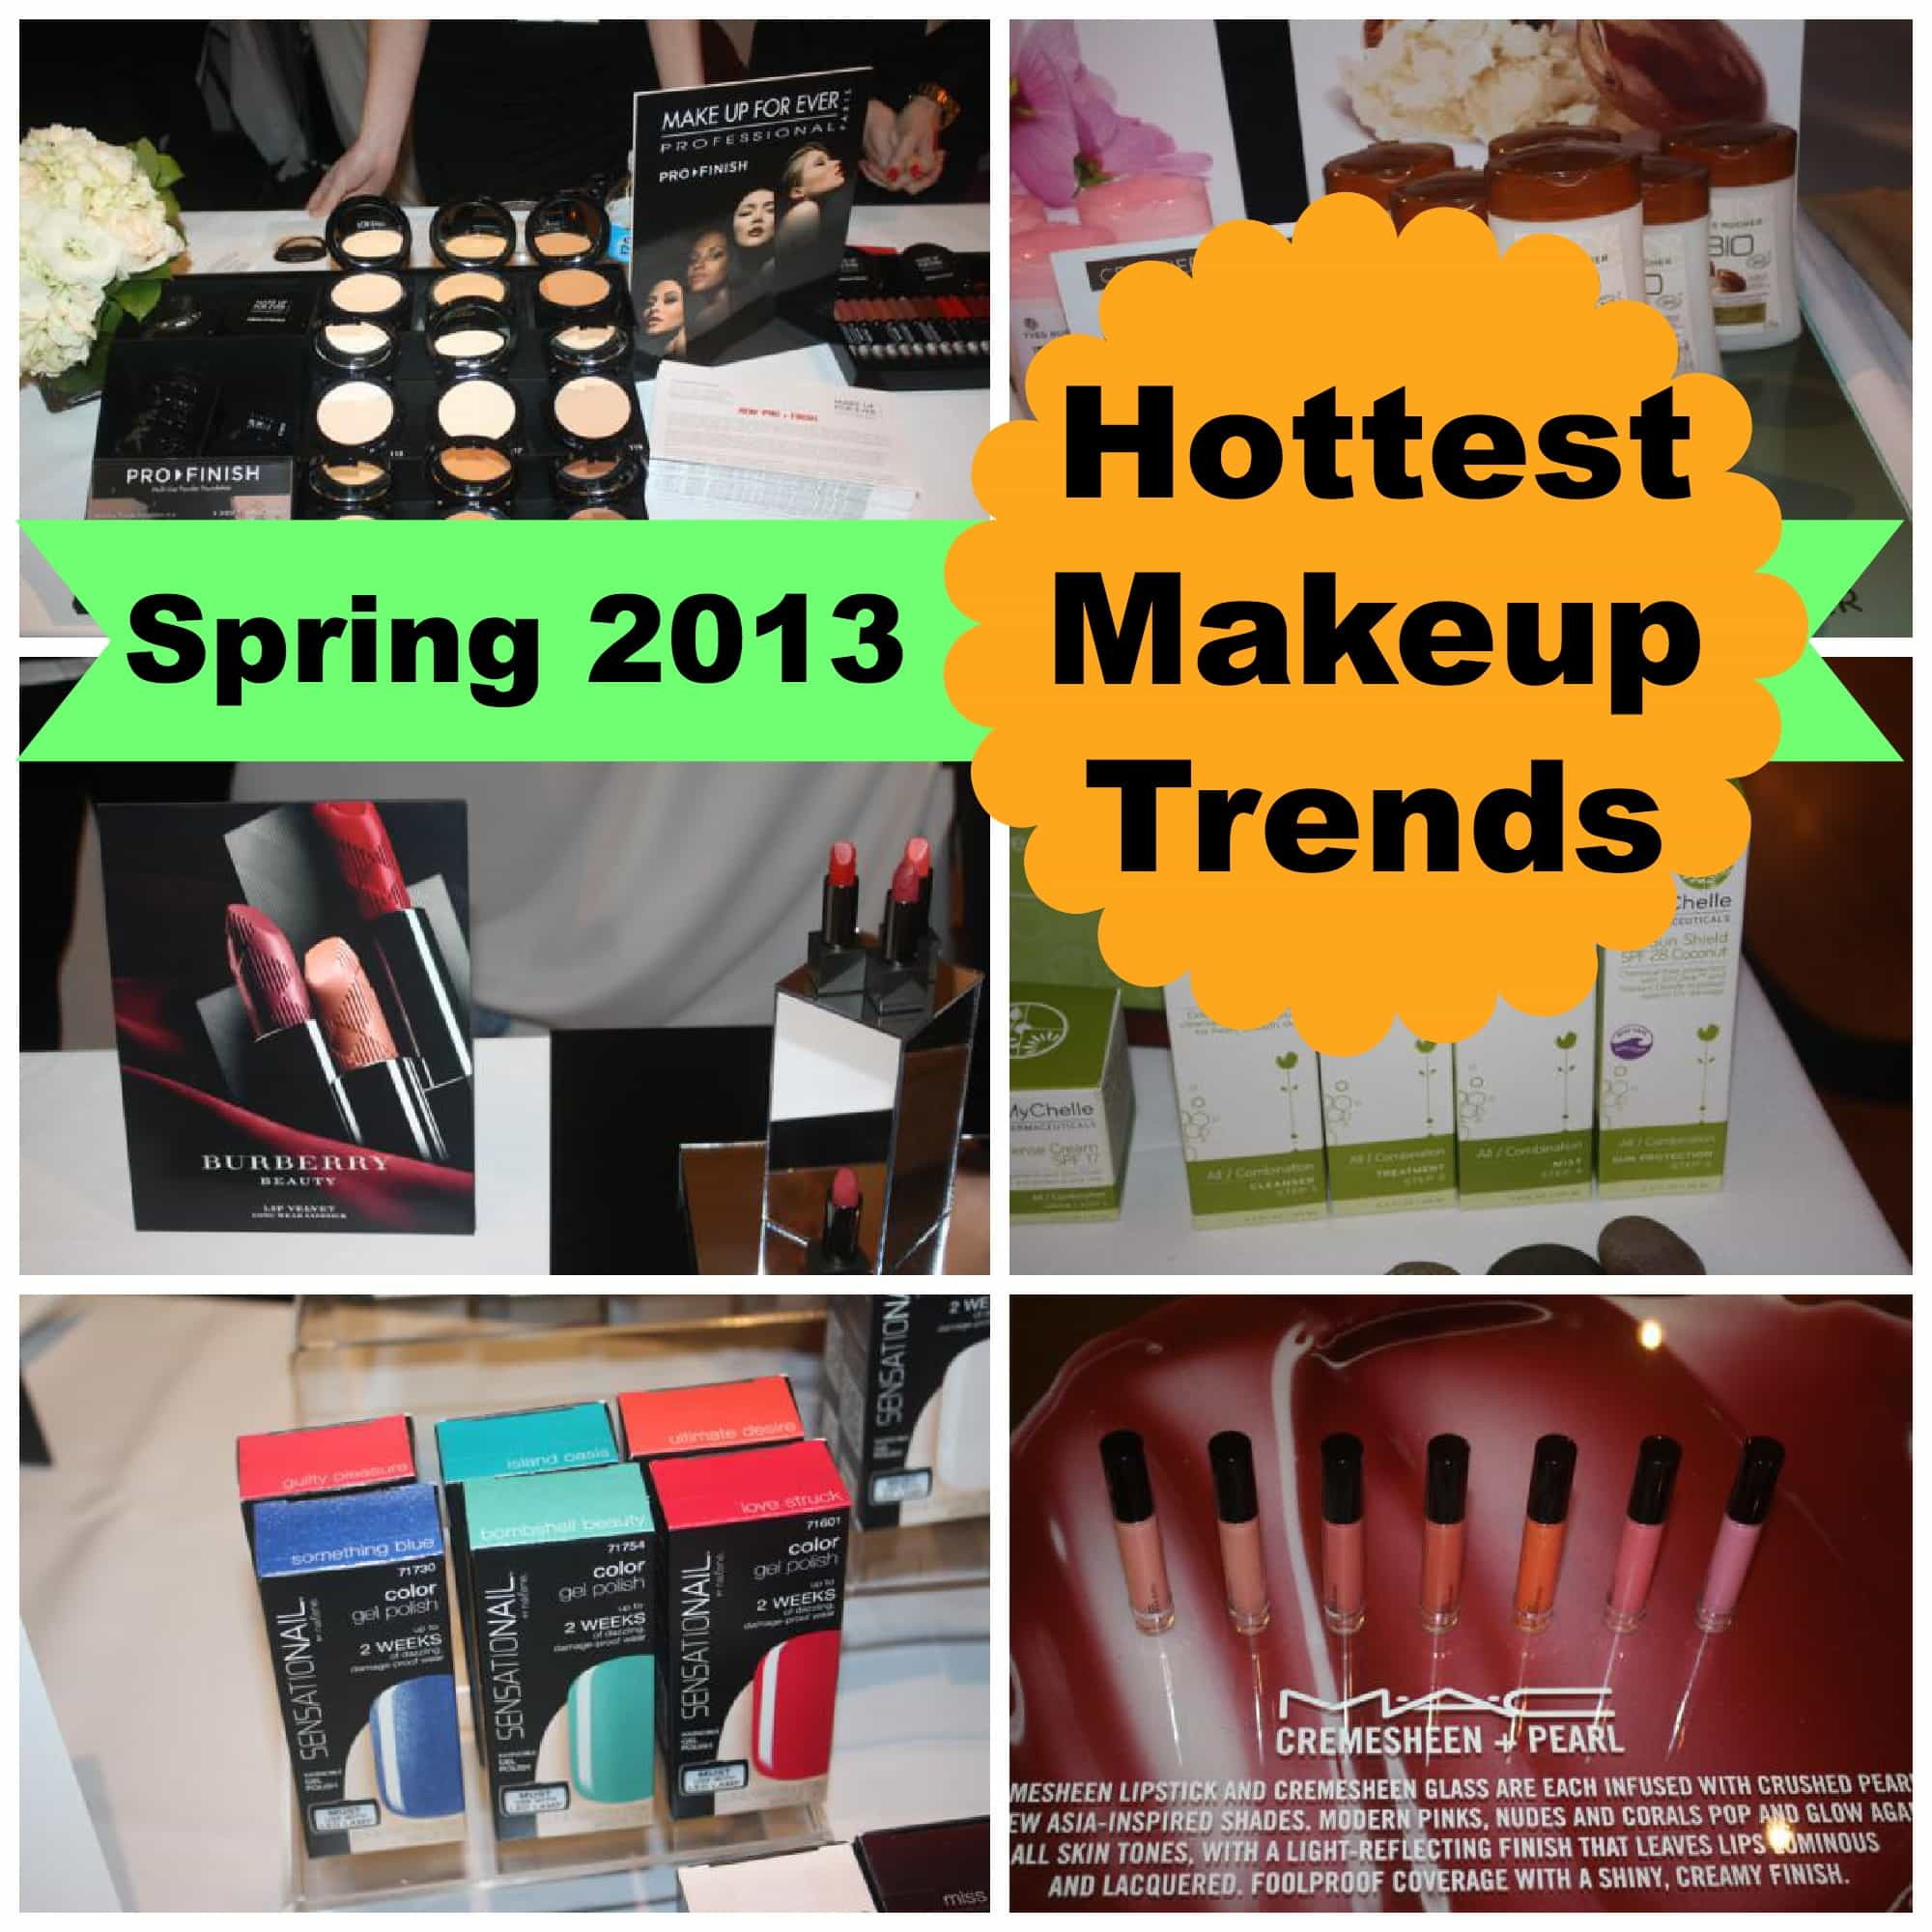 Seasons_hottest_makeup_trends